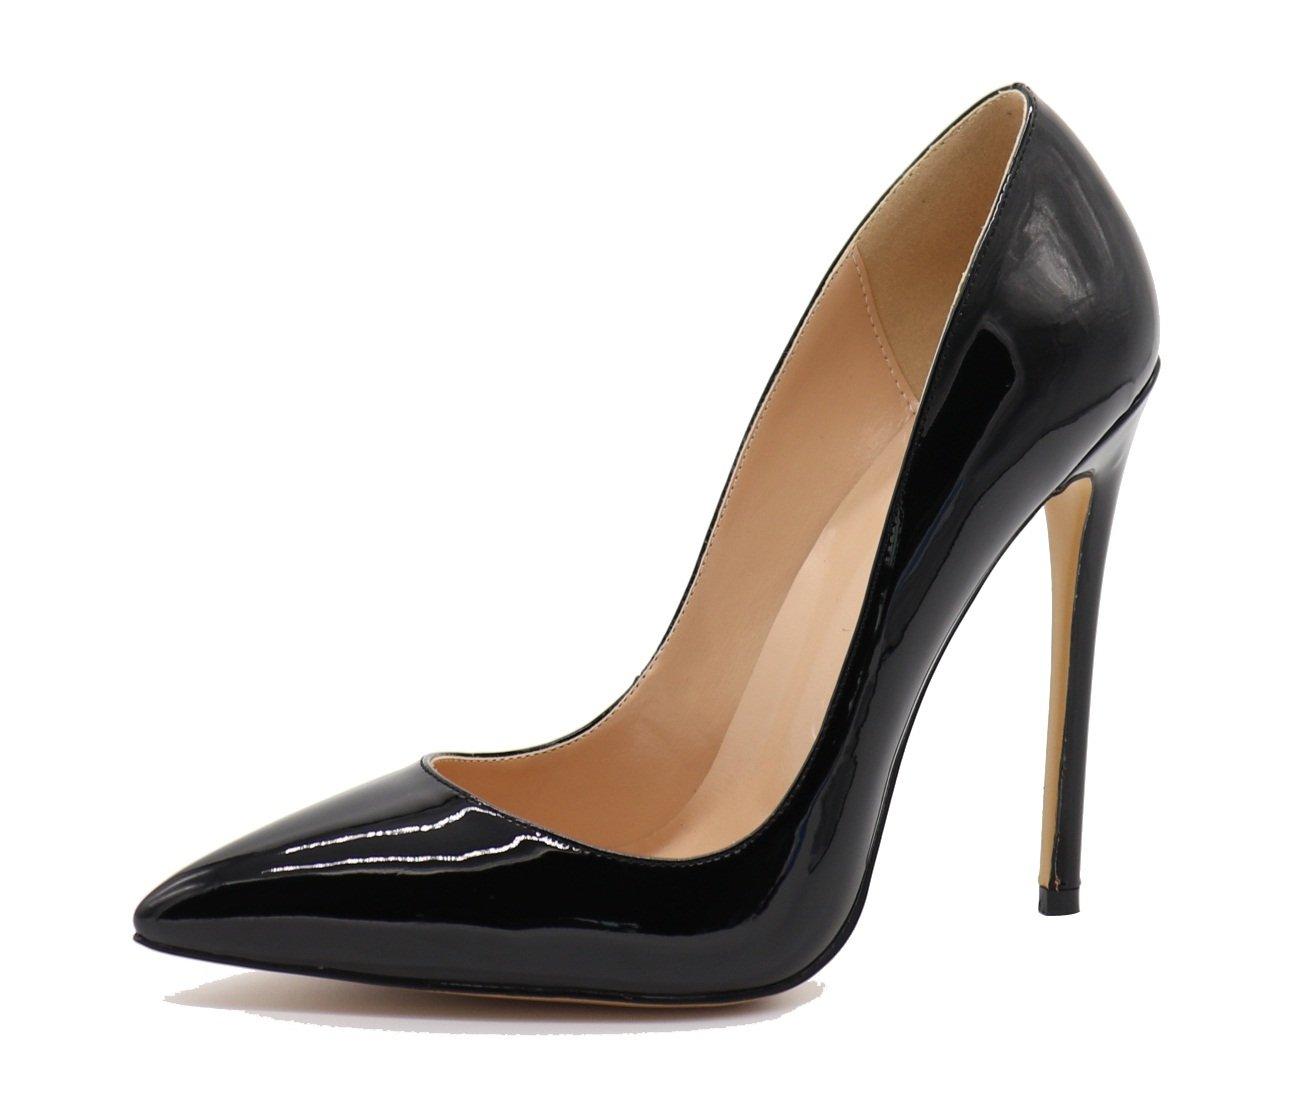 ELASHE - Zapatos de Mujer Tacon Alto - 12 CM Clásicas Tacones Altos - Boda Wedding Cerrado Mujer 41 EU Beige